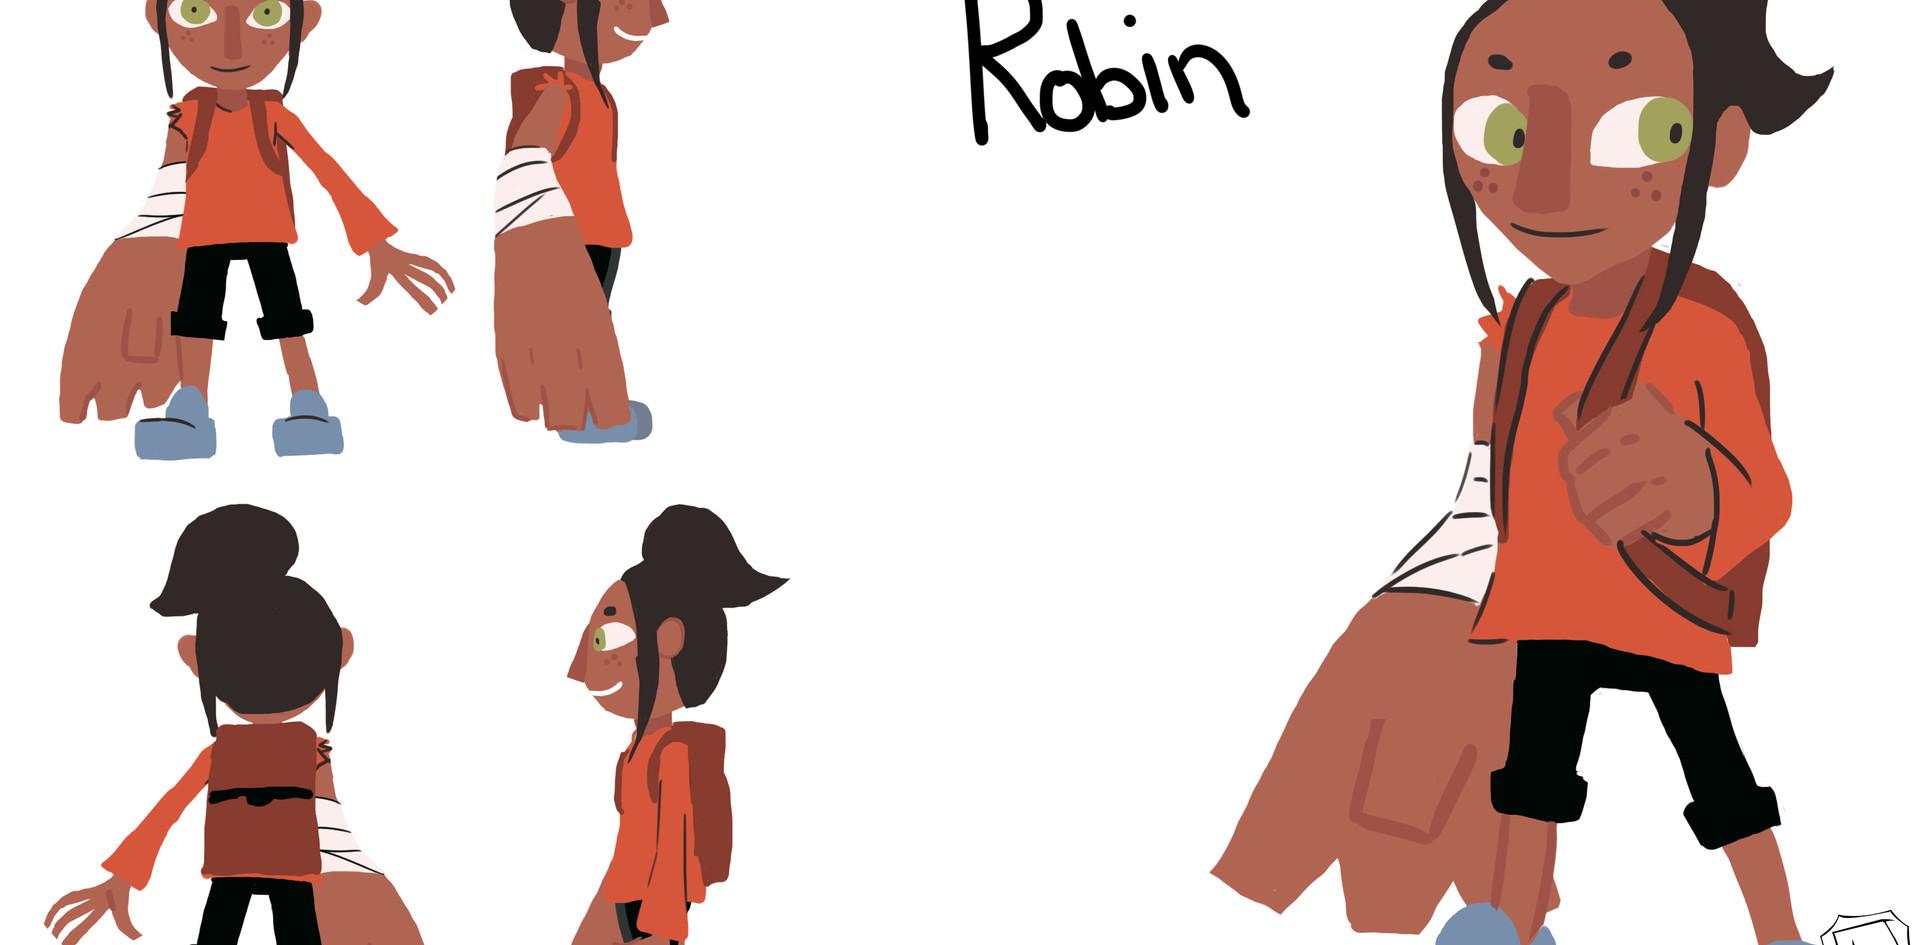 Robin_design_3_jpg.jpg